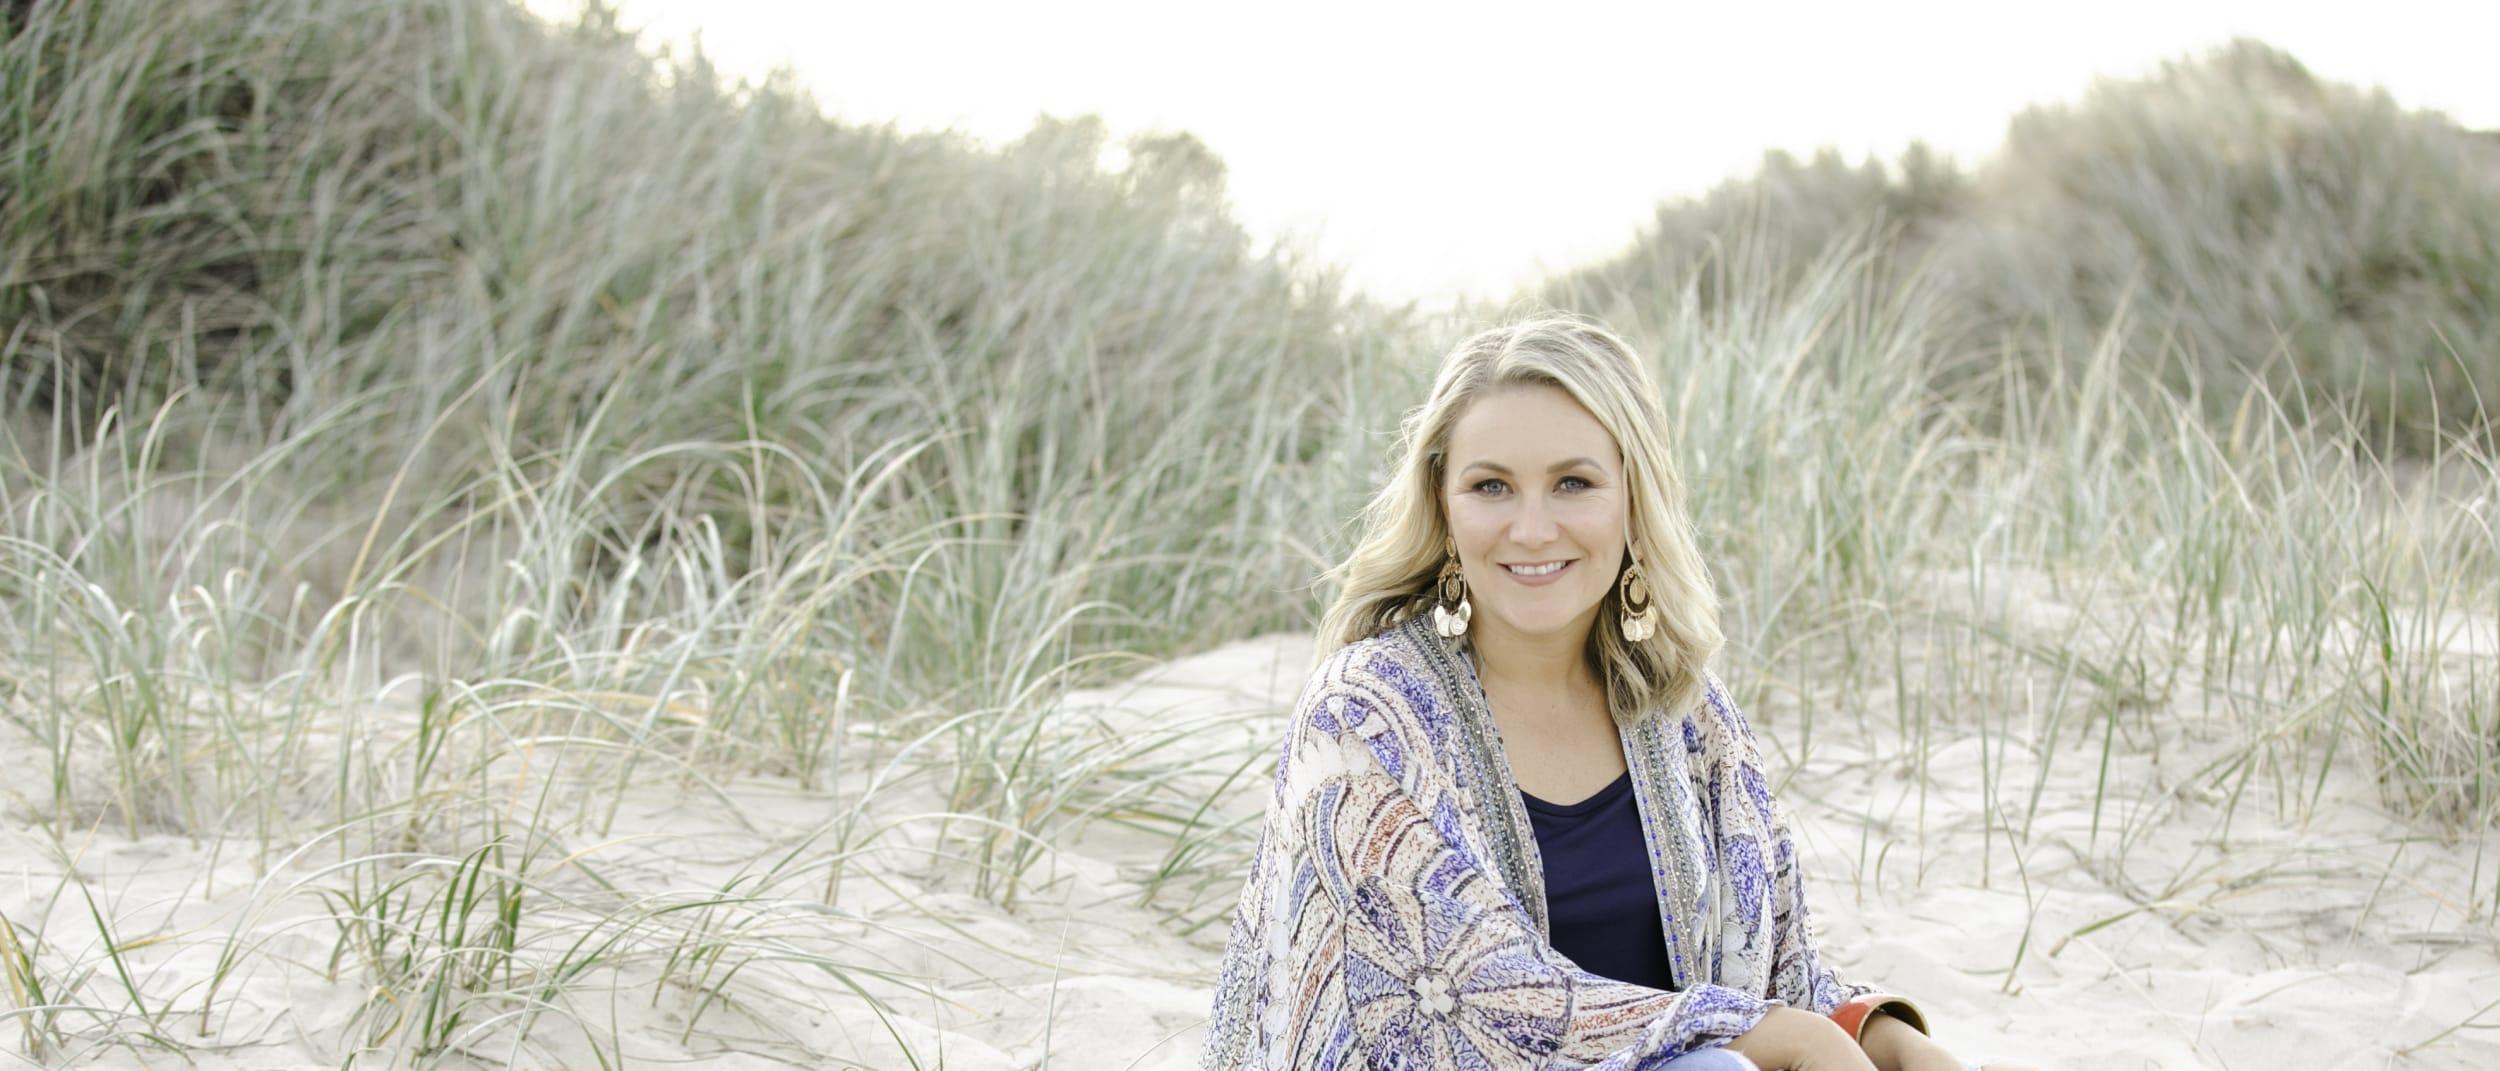 Chillpreneur Book Tour with Denise Duffield-Thomas